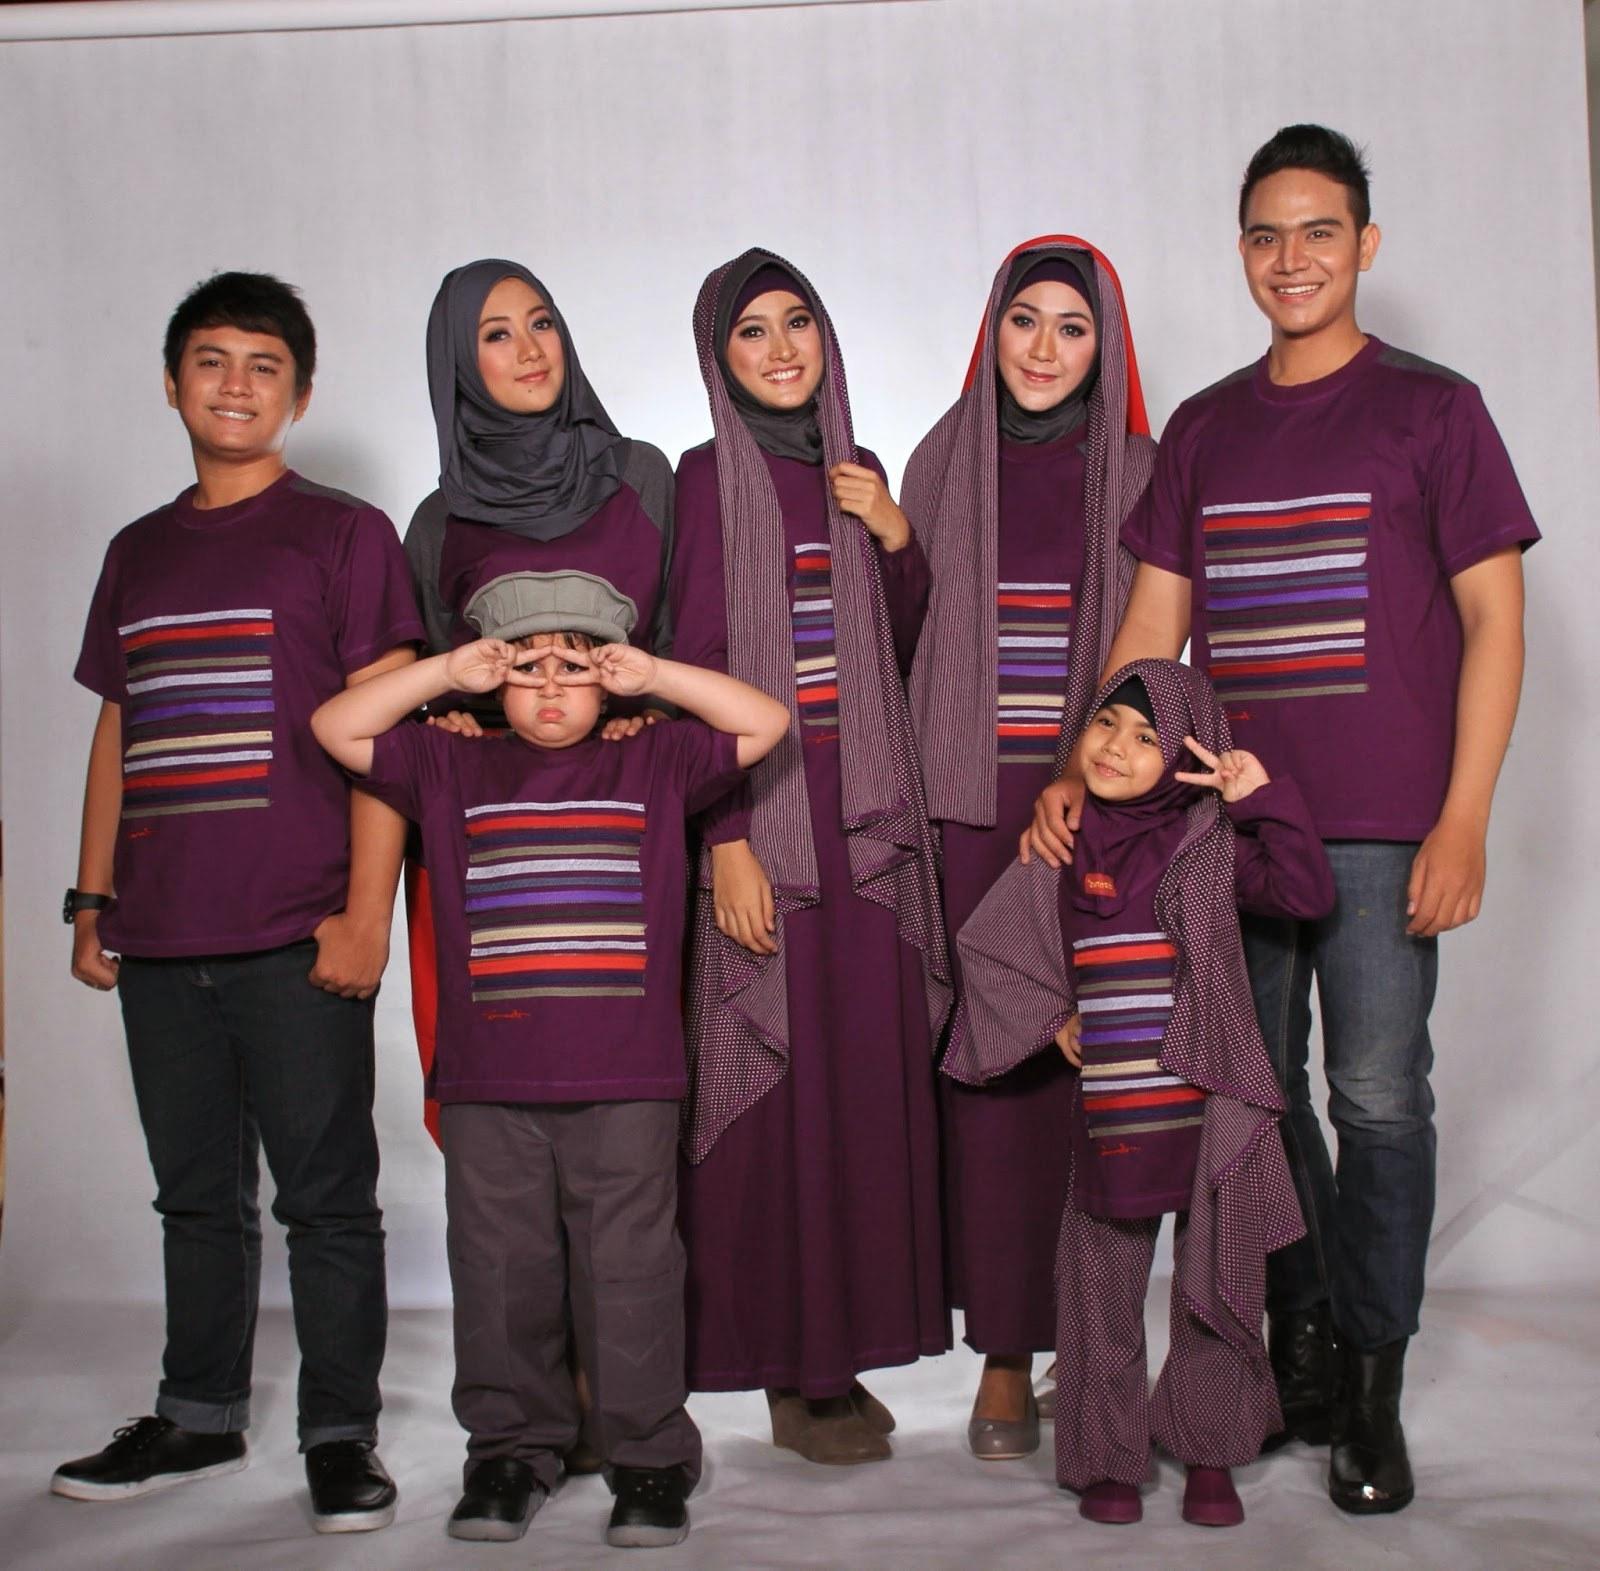 Design Model Baju Lebaran Anak 2018 Rldj Model Baju Keluarga Untuk Hari Raya Lebaran 2018